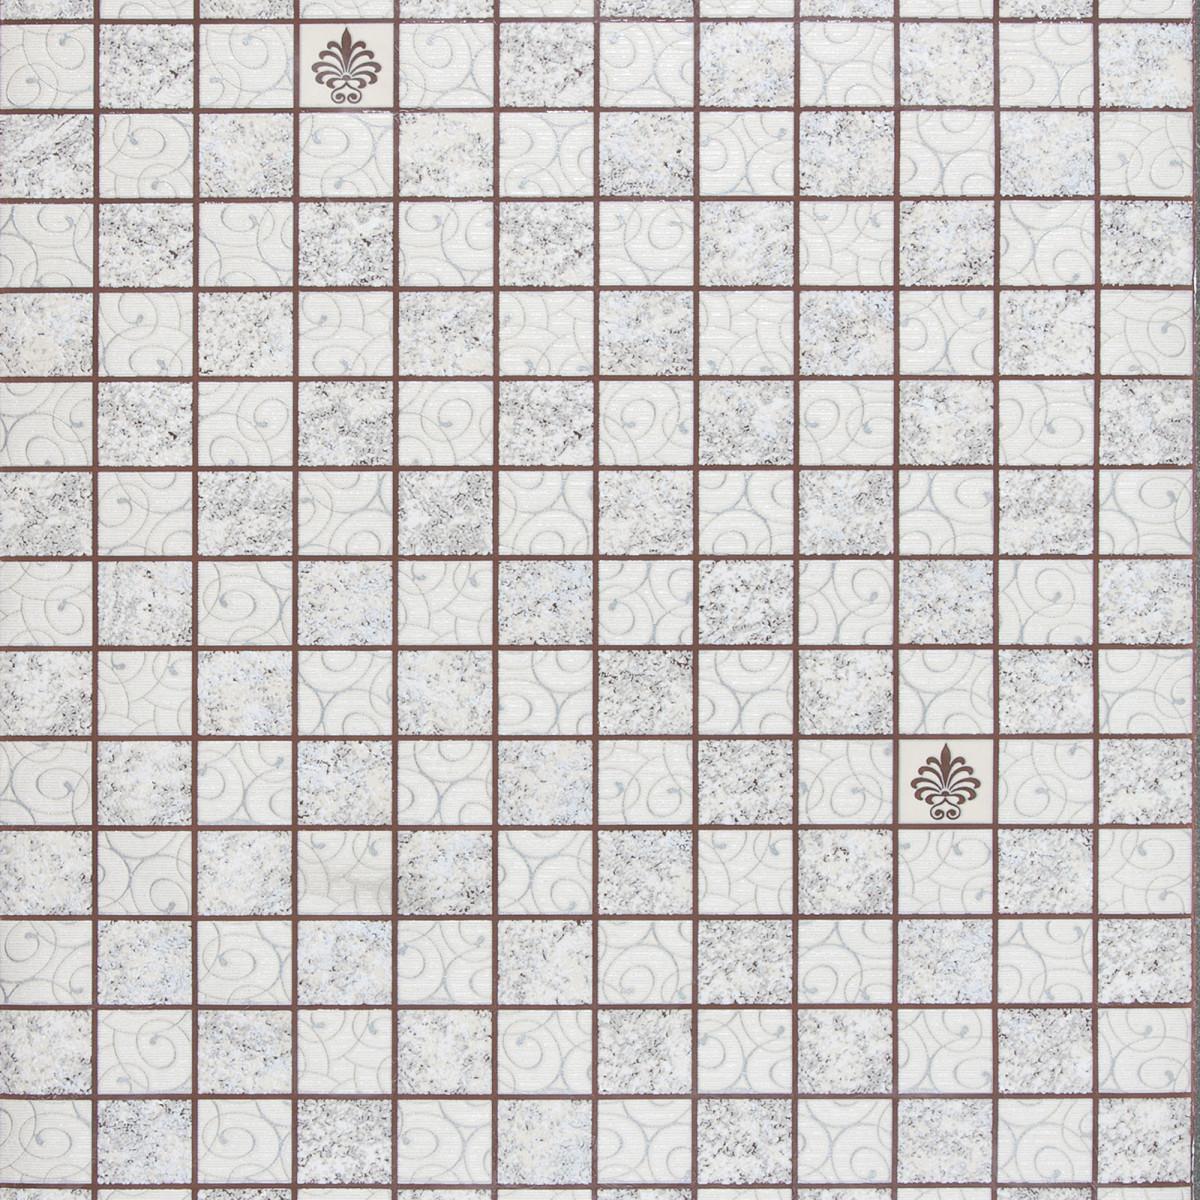 Обои на бумажной основе 0.53х10 м цвет бежевый АС Пал 10014-28